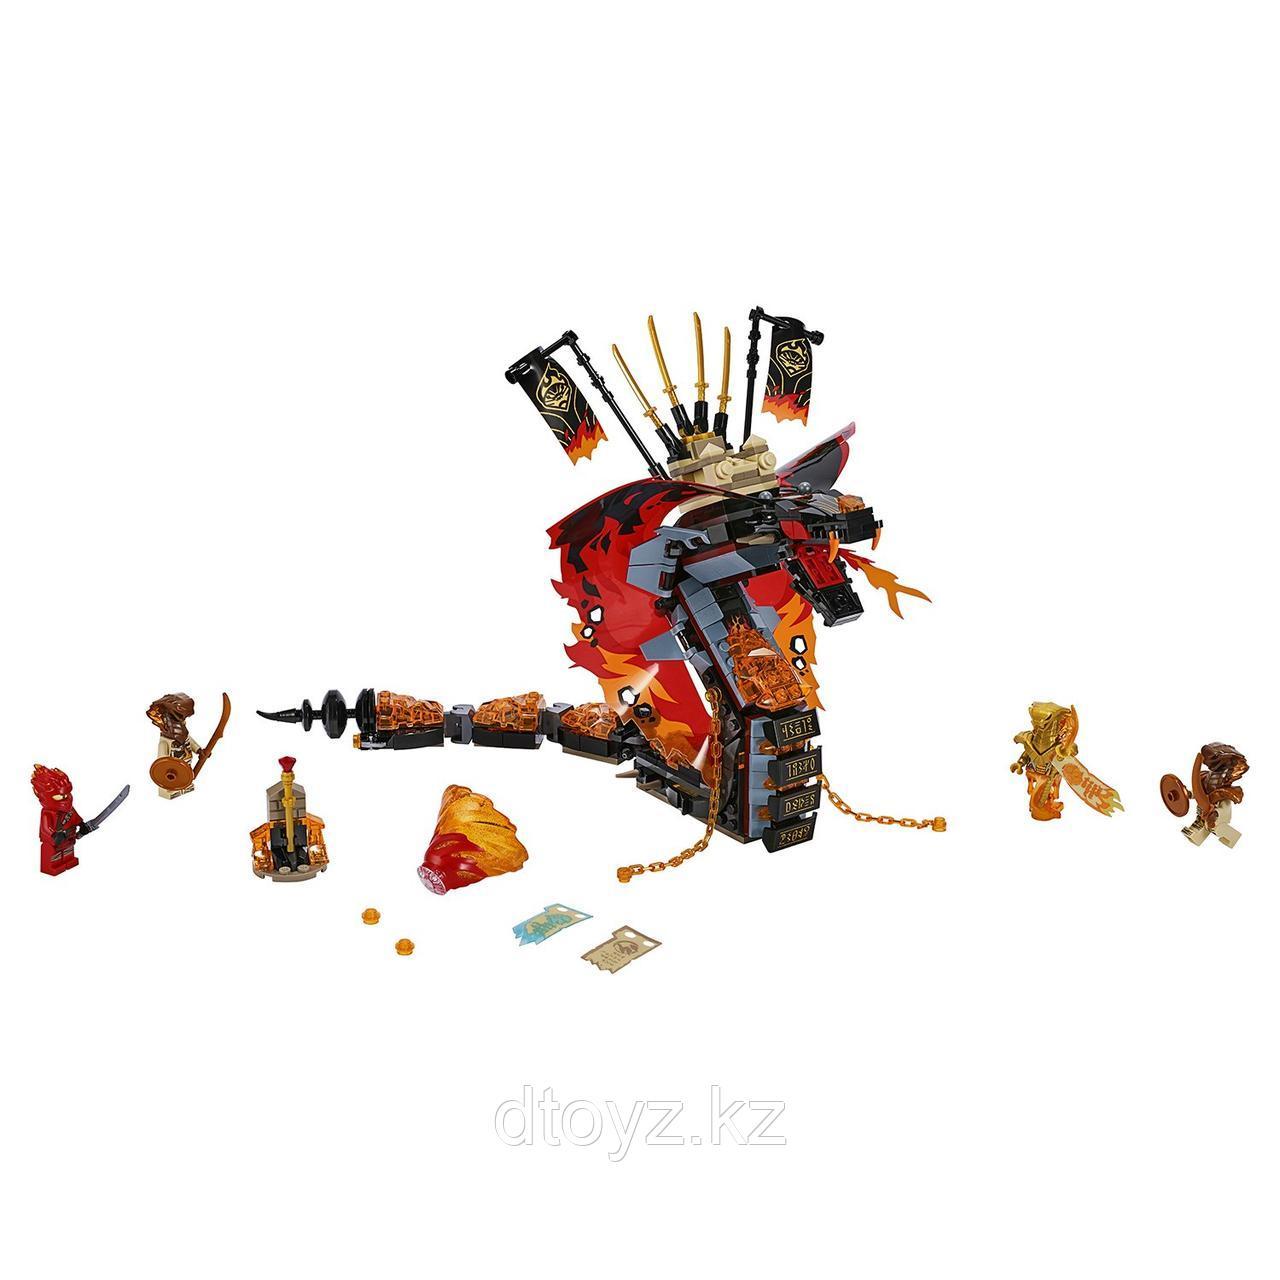 Lego Ninjago 70674 Огненный кинжал, Лего Ниндзяго - фото 2